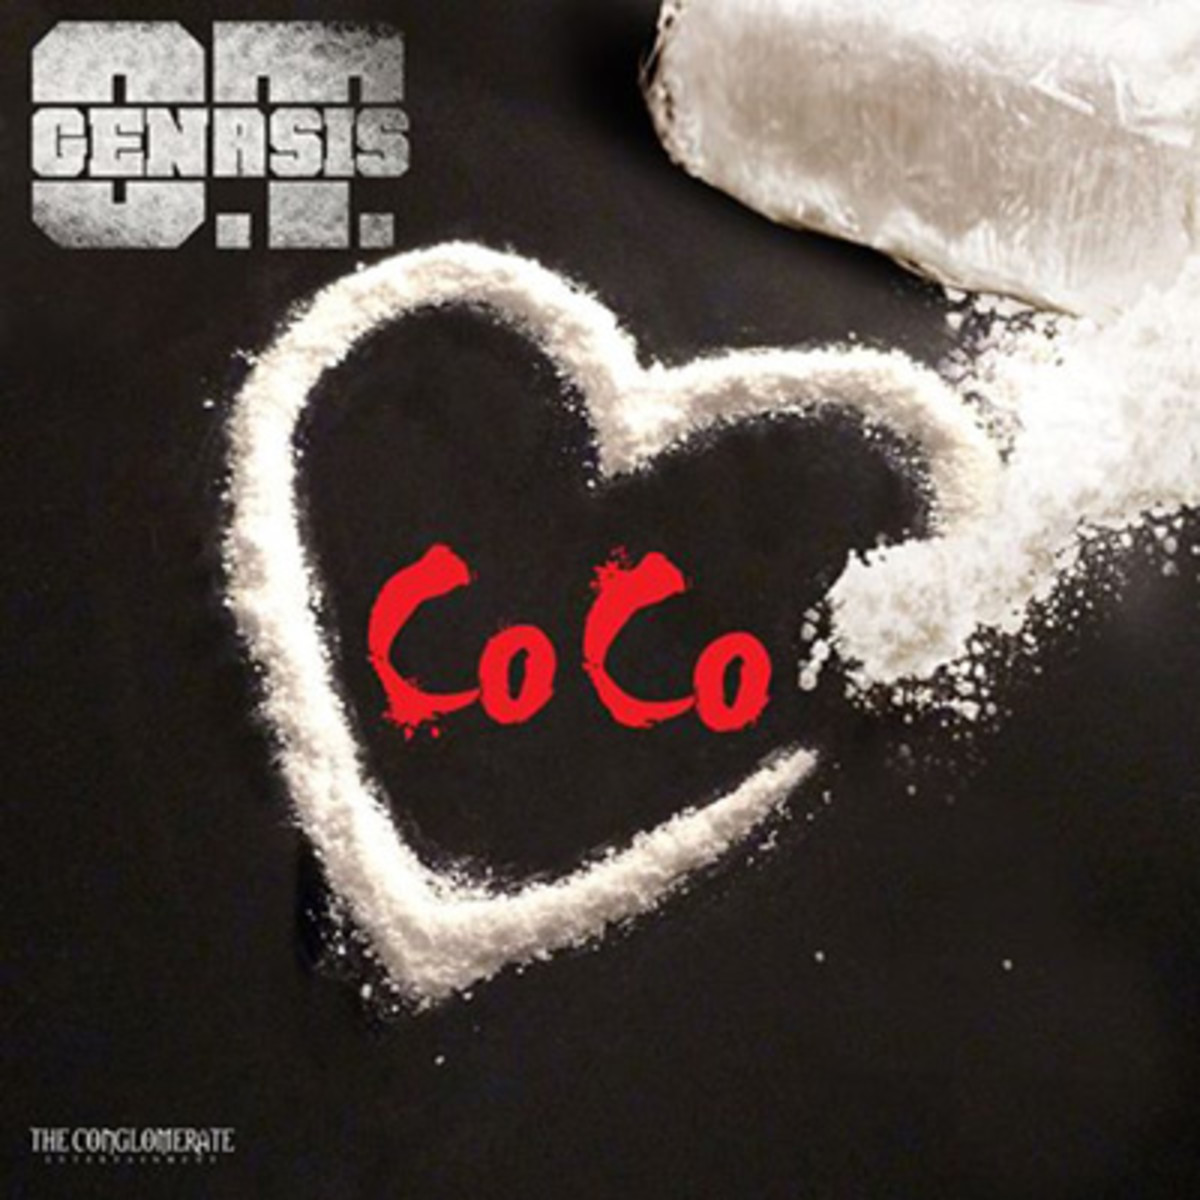 otgenasis-coco.jpg